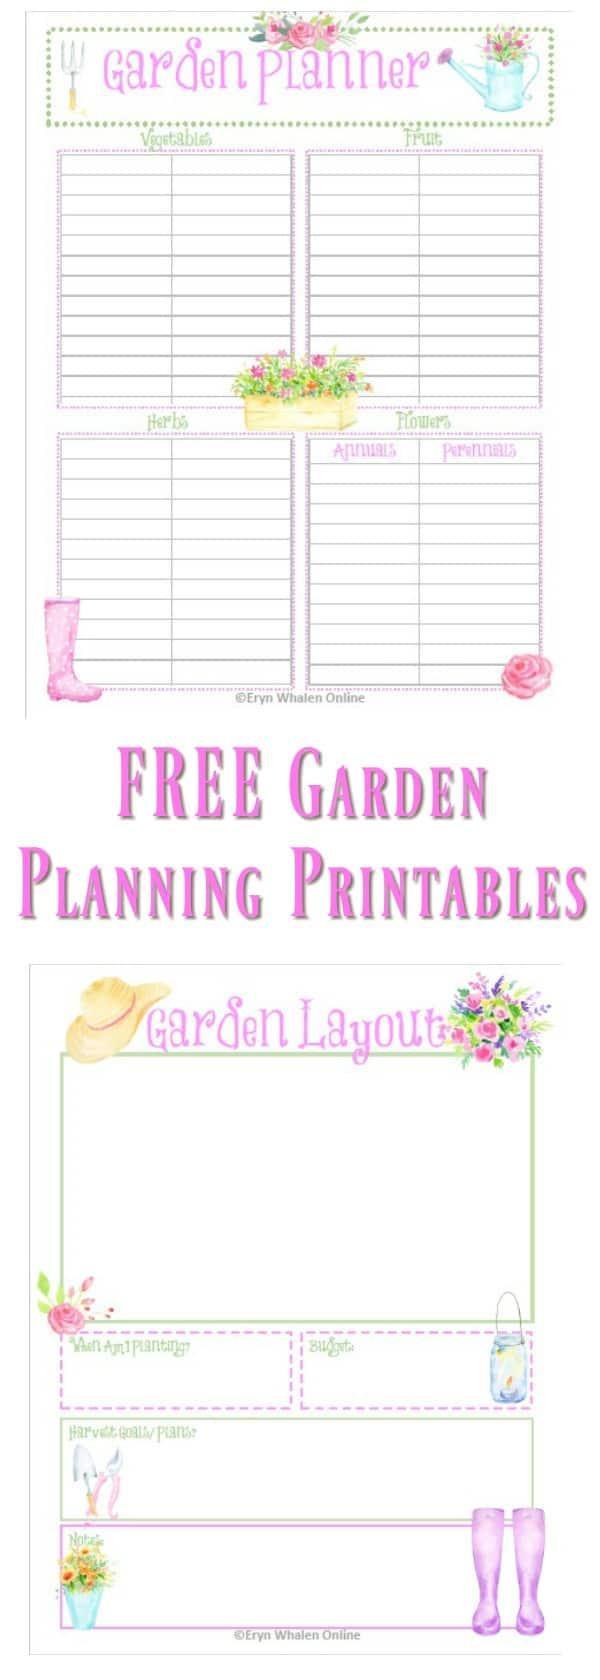 printables, gardening, planting, vegetables